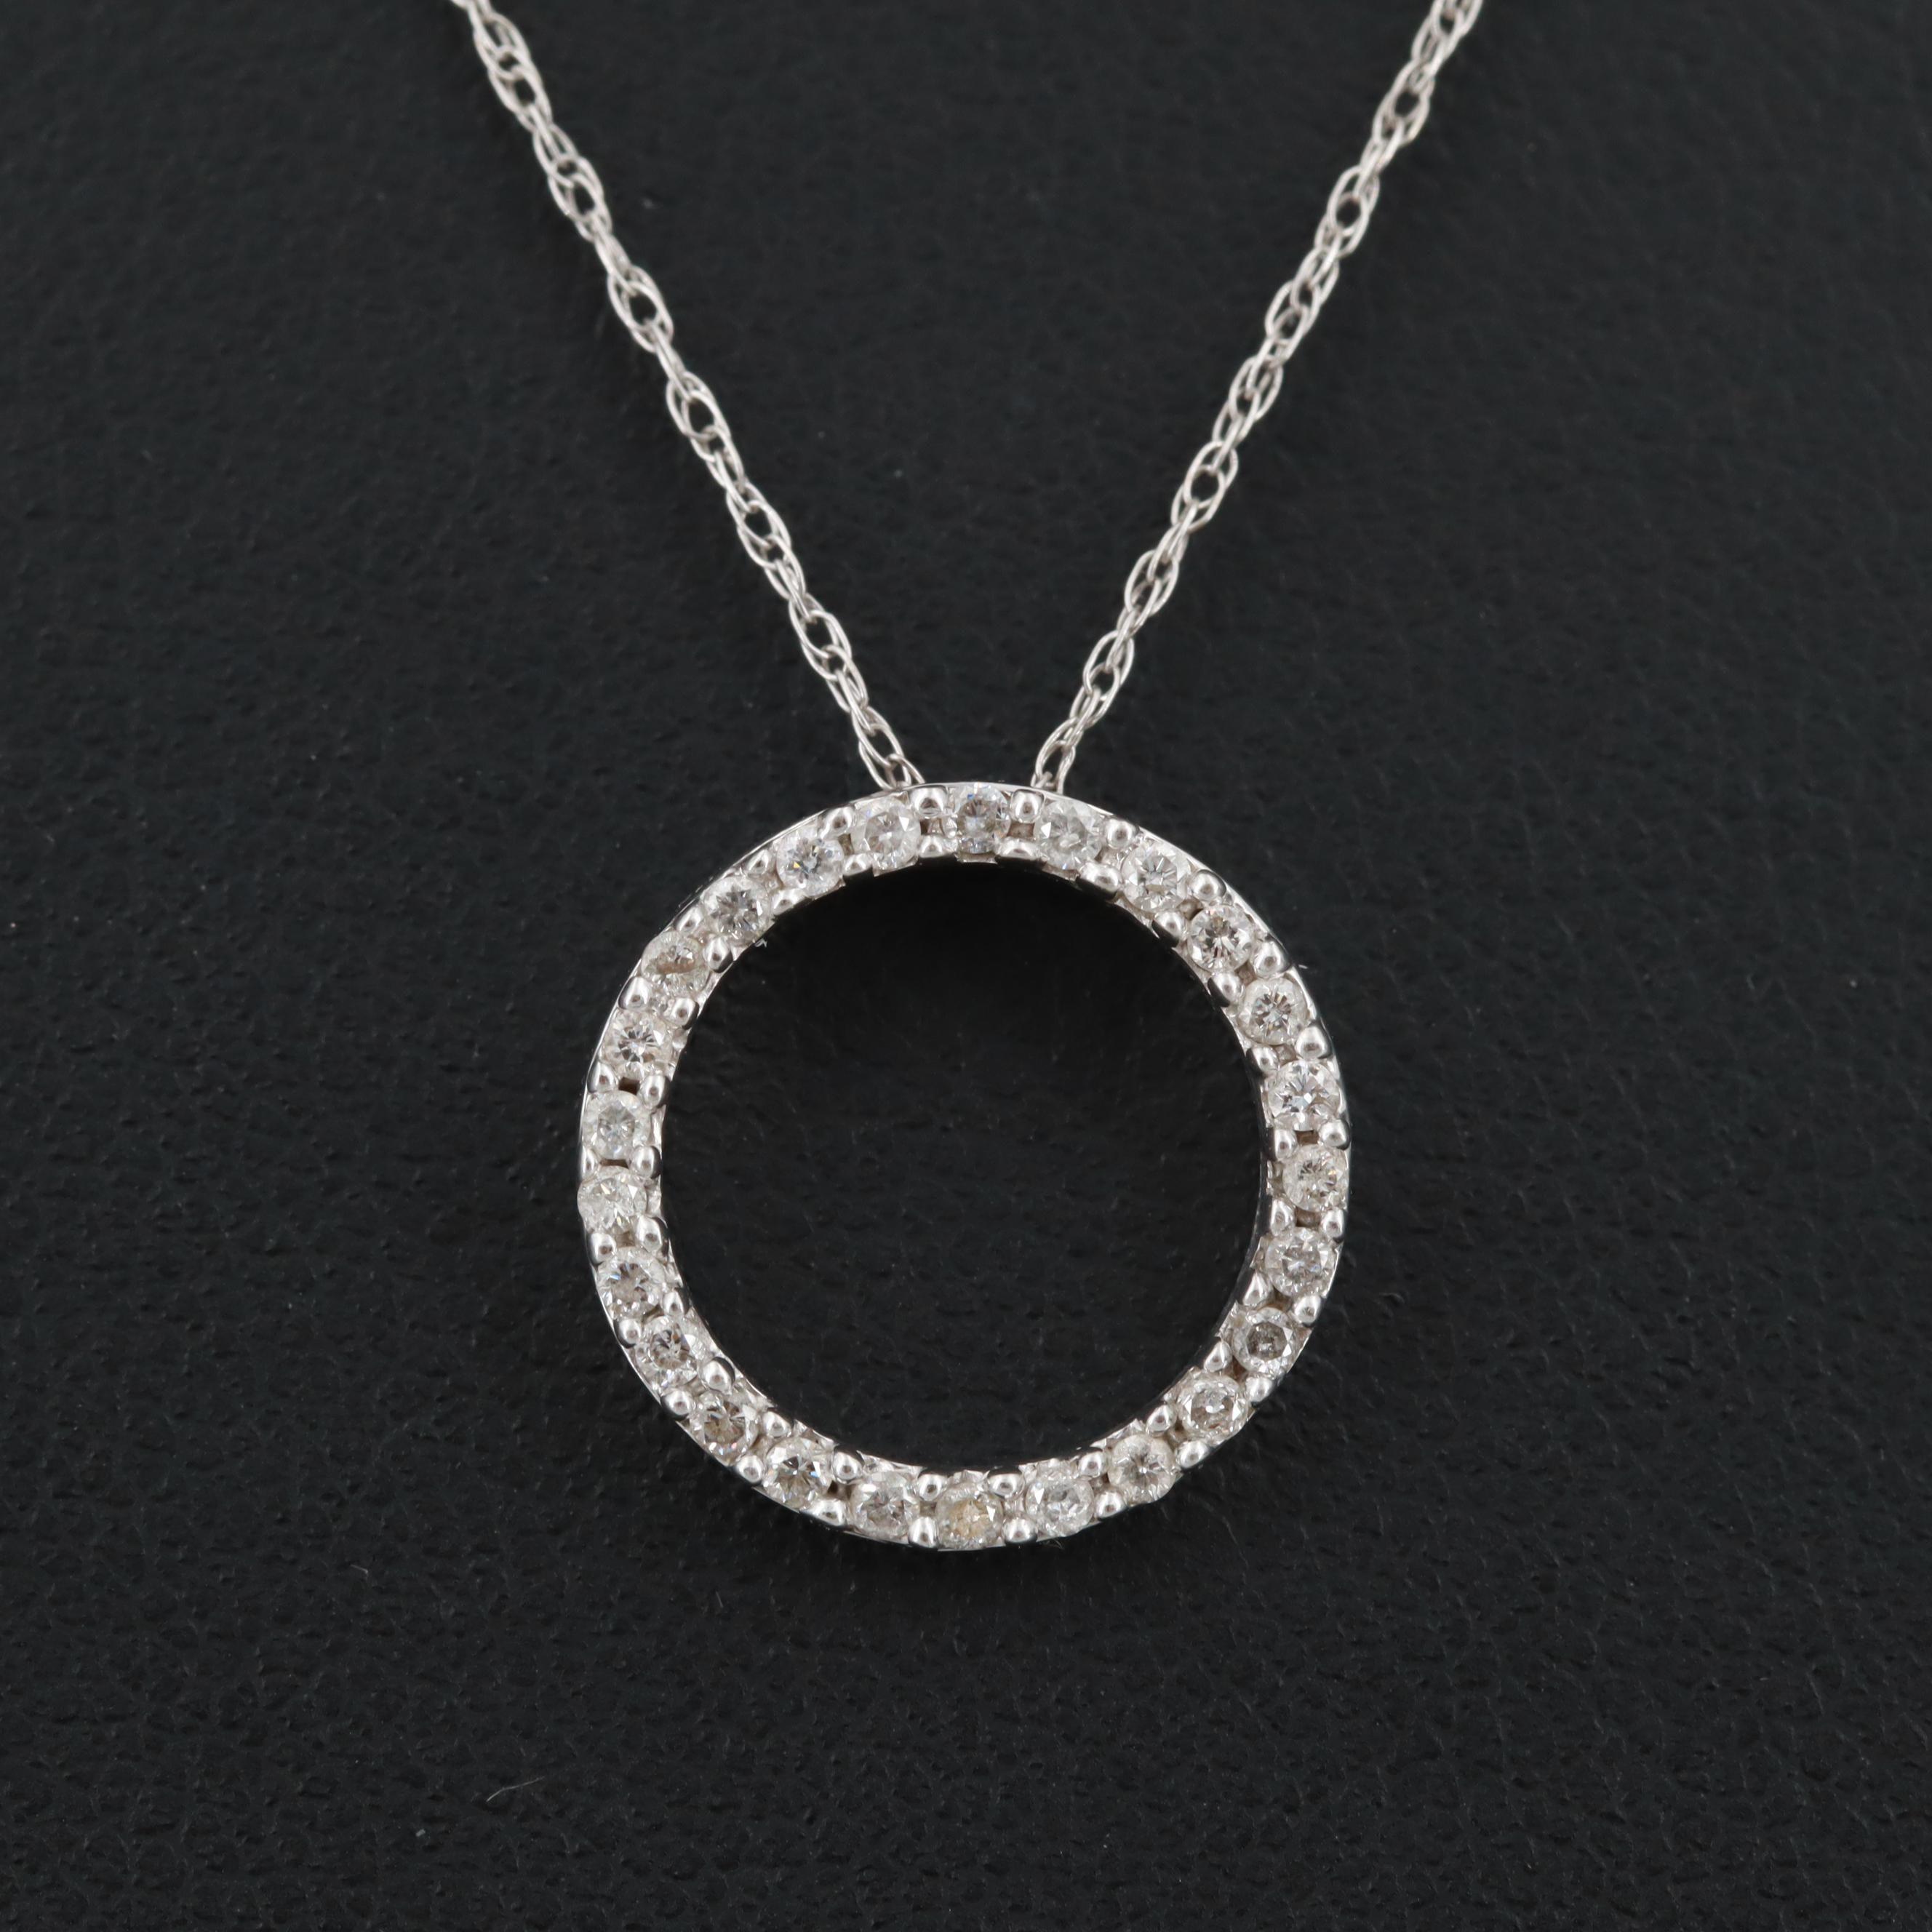 10K and 14K White Gold Diamond Pendant Necklace